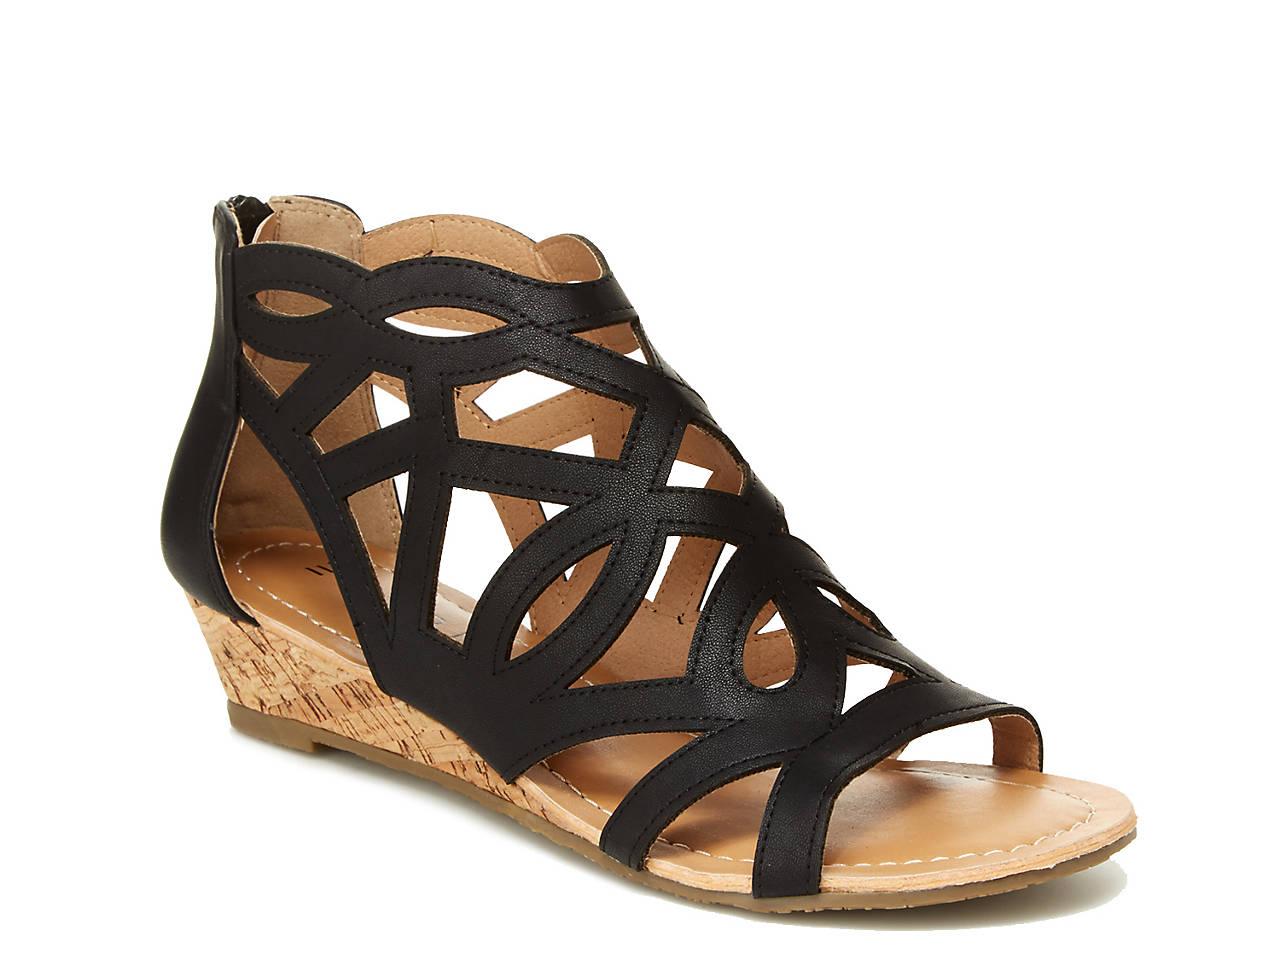 ESPRIT Cecily Wedge Sandals